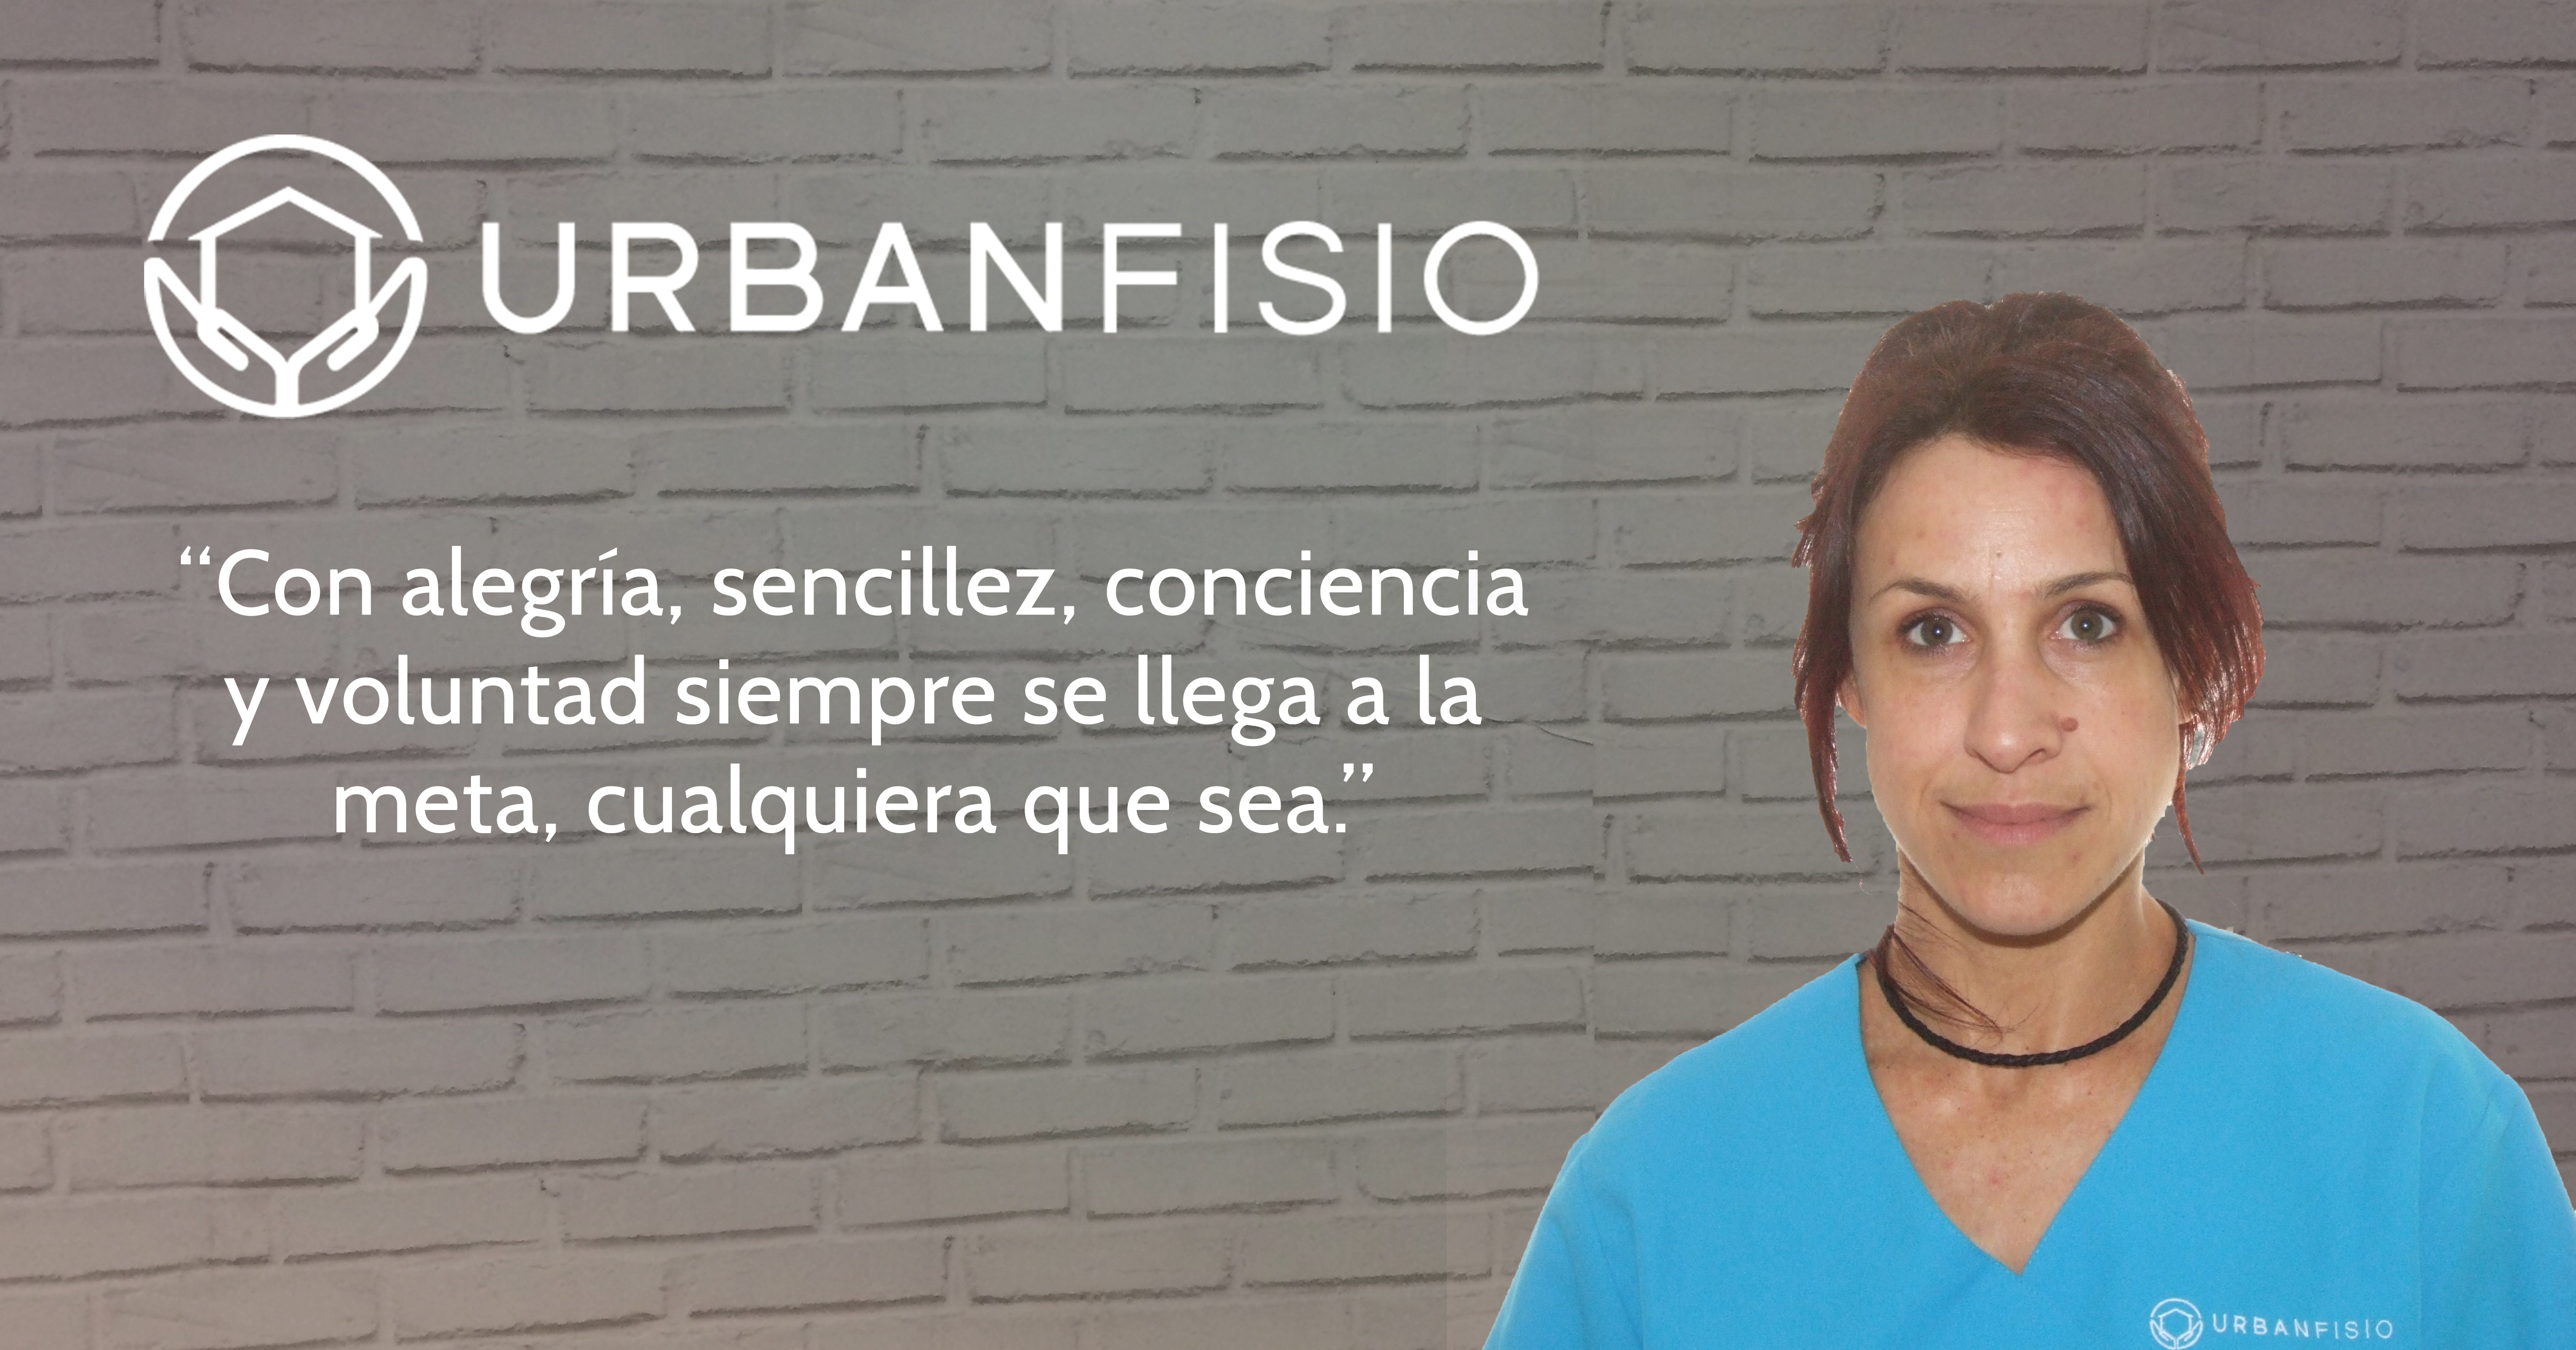 UrbanFisio Marga Sánchez